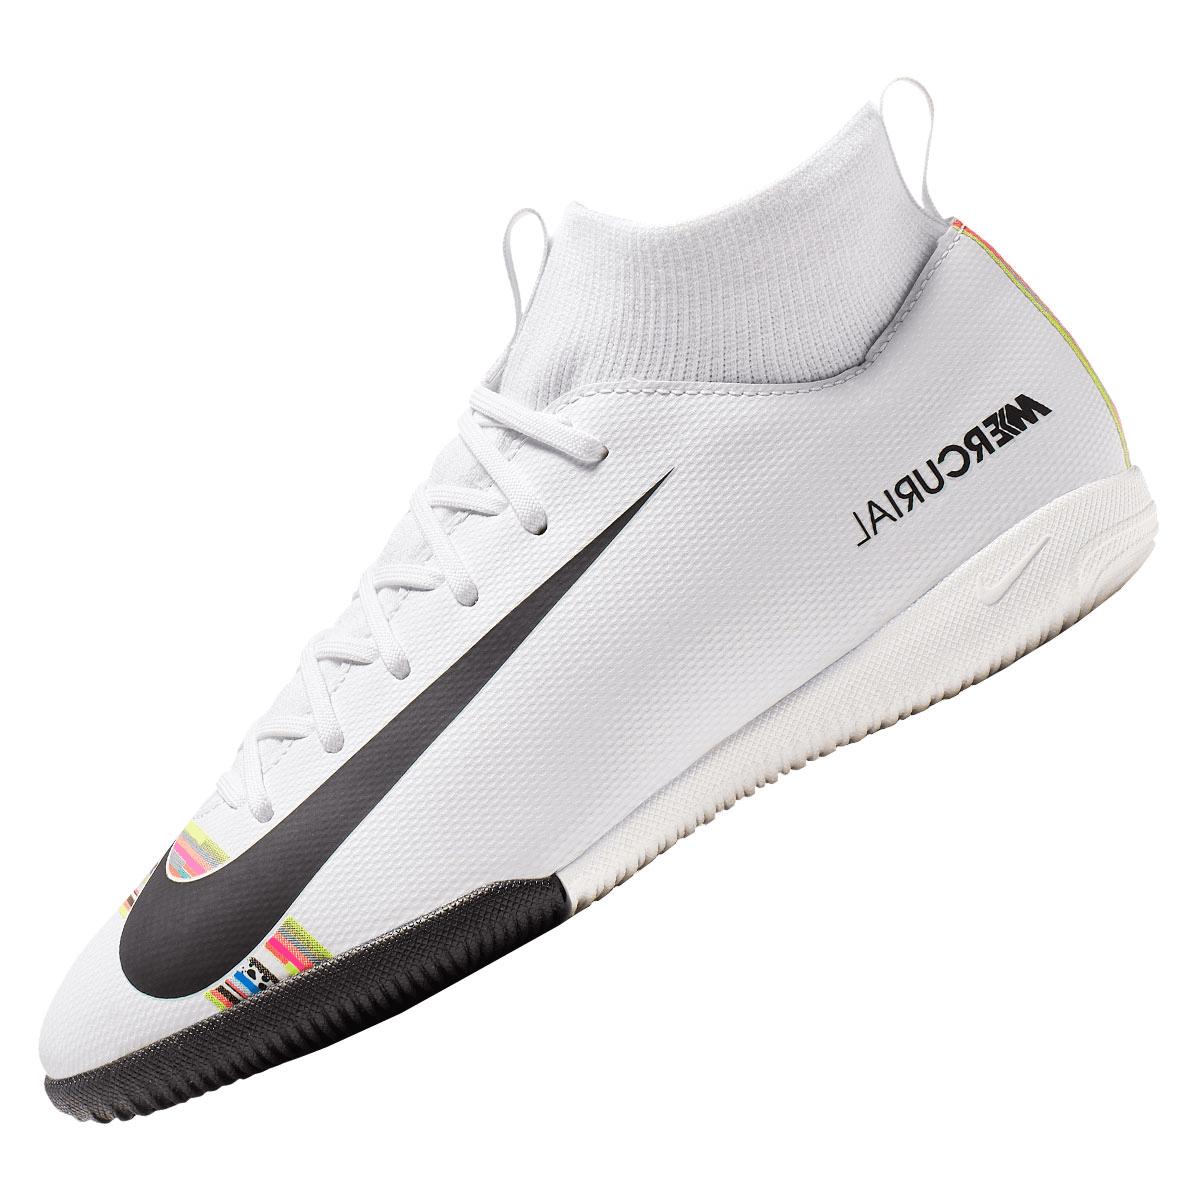 4c97a136afdeb Nike Kinder Hallenschuh Mercurial Superfly VI JR Academy GS CR7 IC  weiß schwarz Bild 3